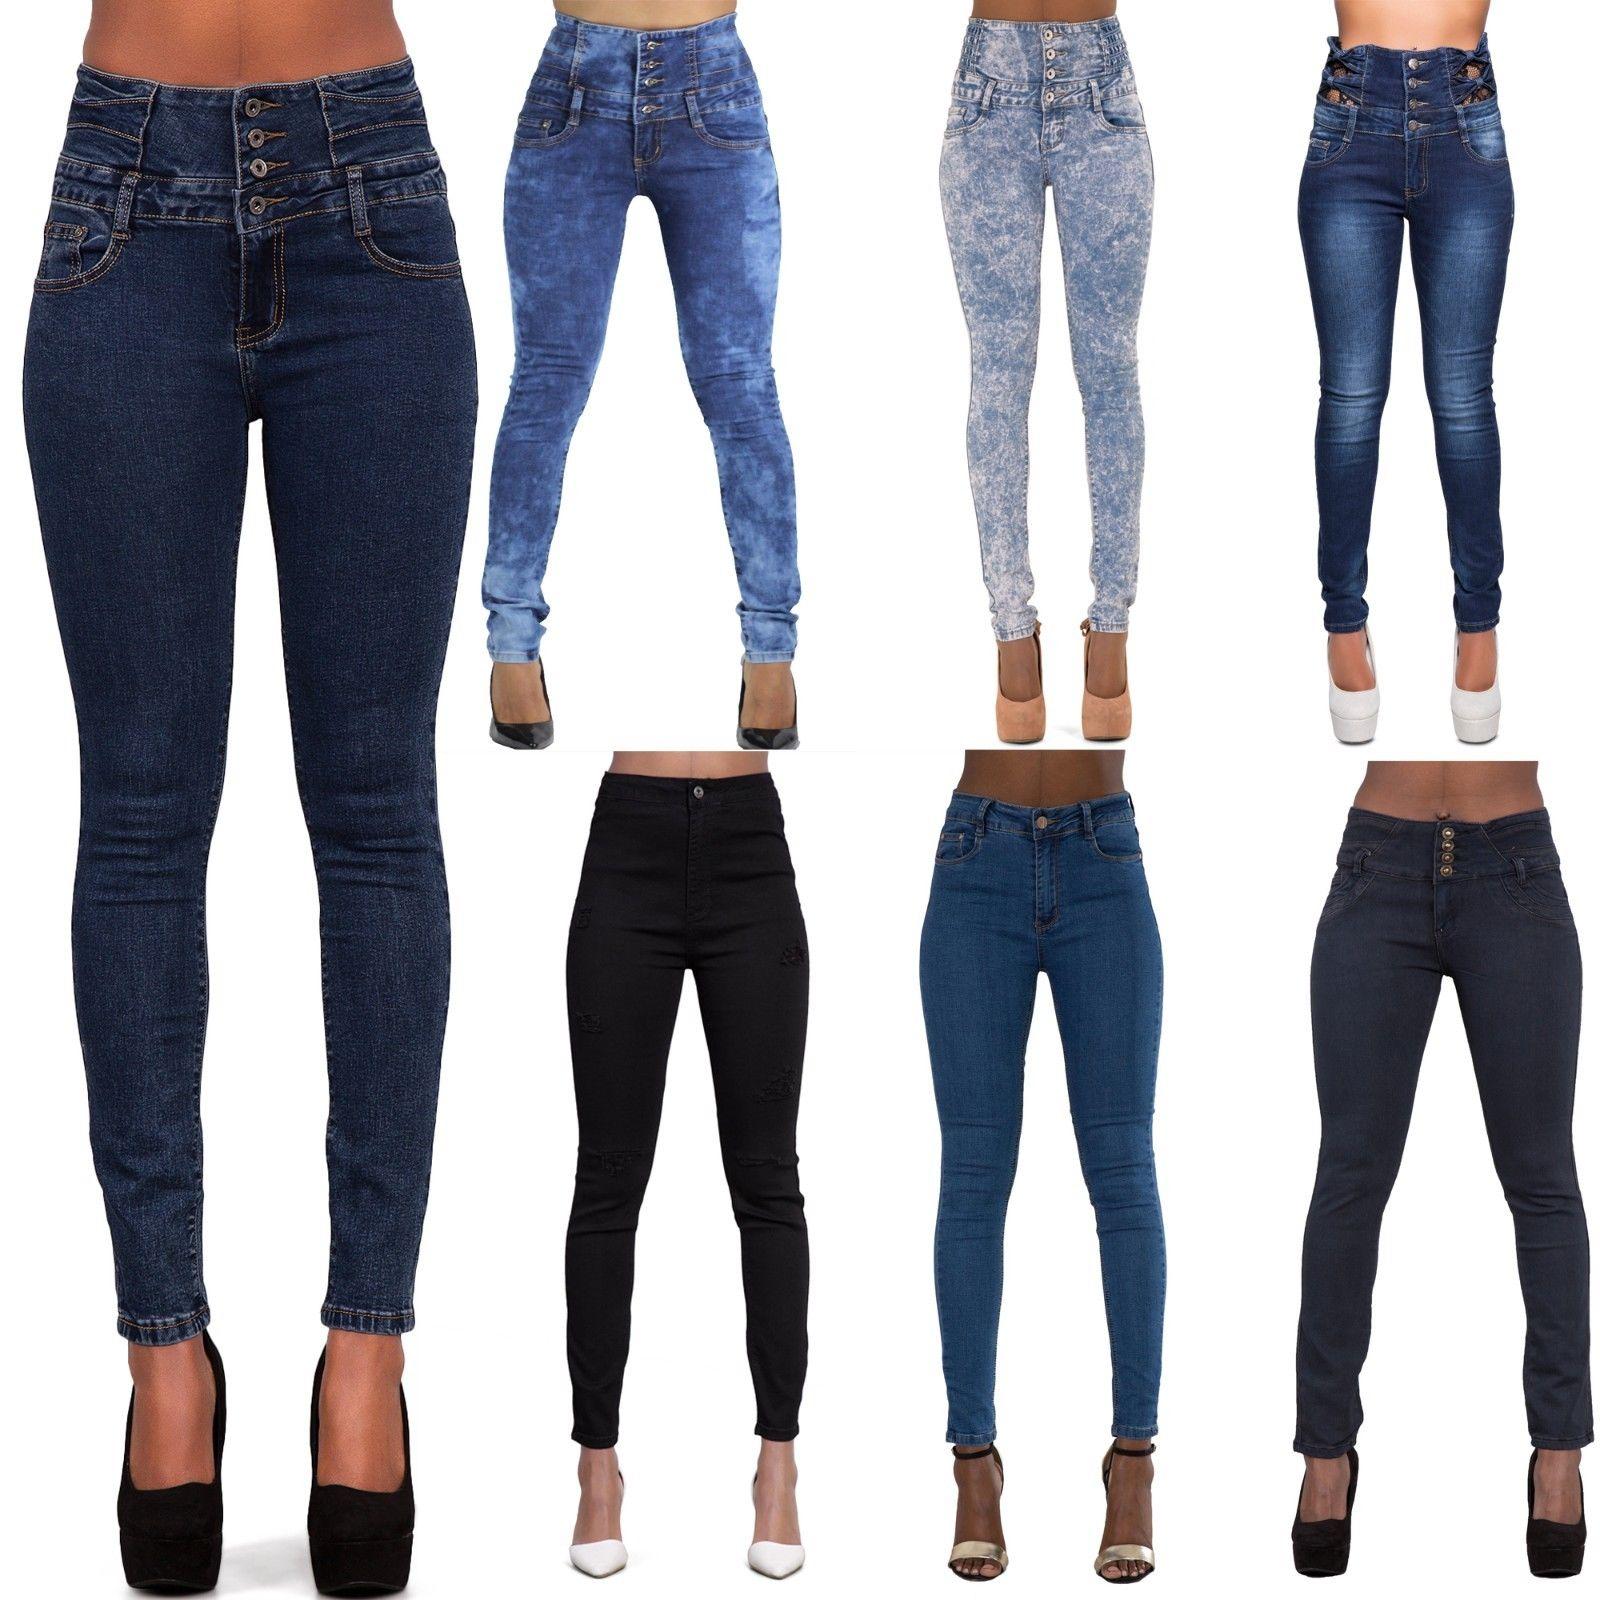 Abbigliamento Denim La vendita delle donne vita alta Jeans Donna Stretch Denim skinny slim Pantaloni Taglia 6-16